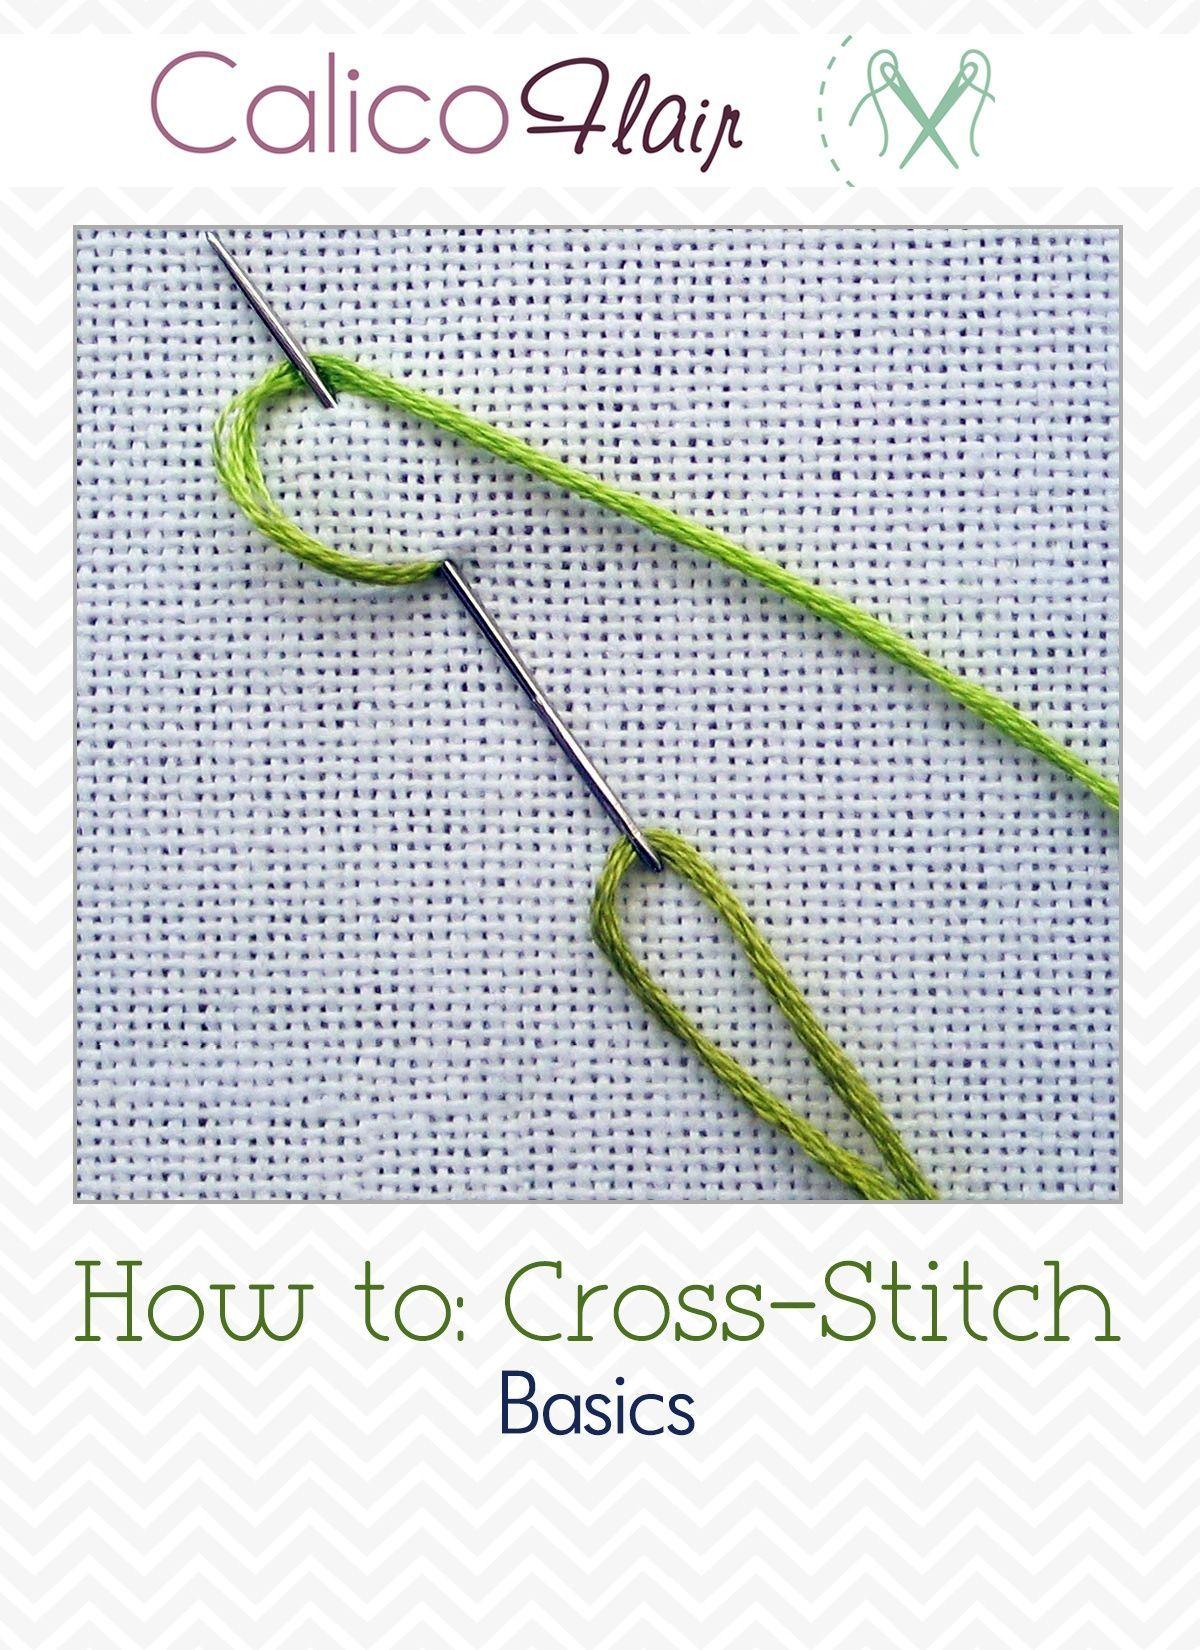 Free How to: Cross-Stitch Basics Tutorial